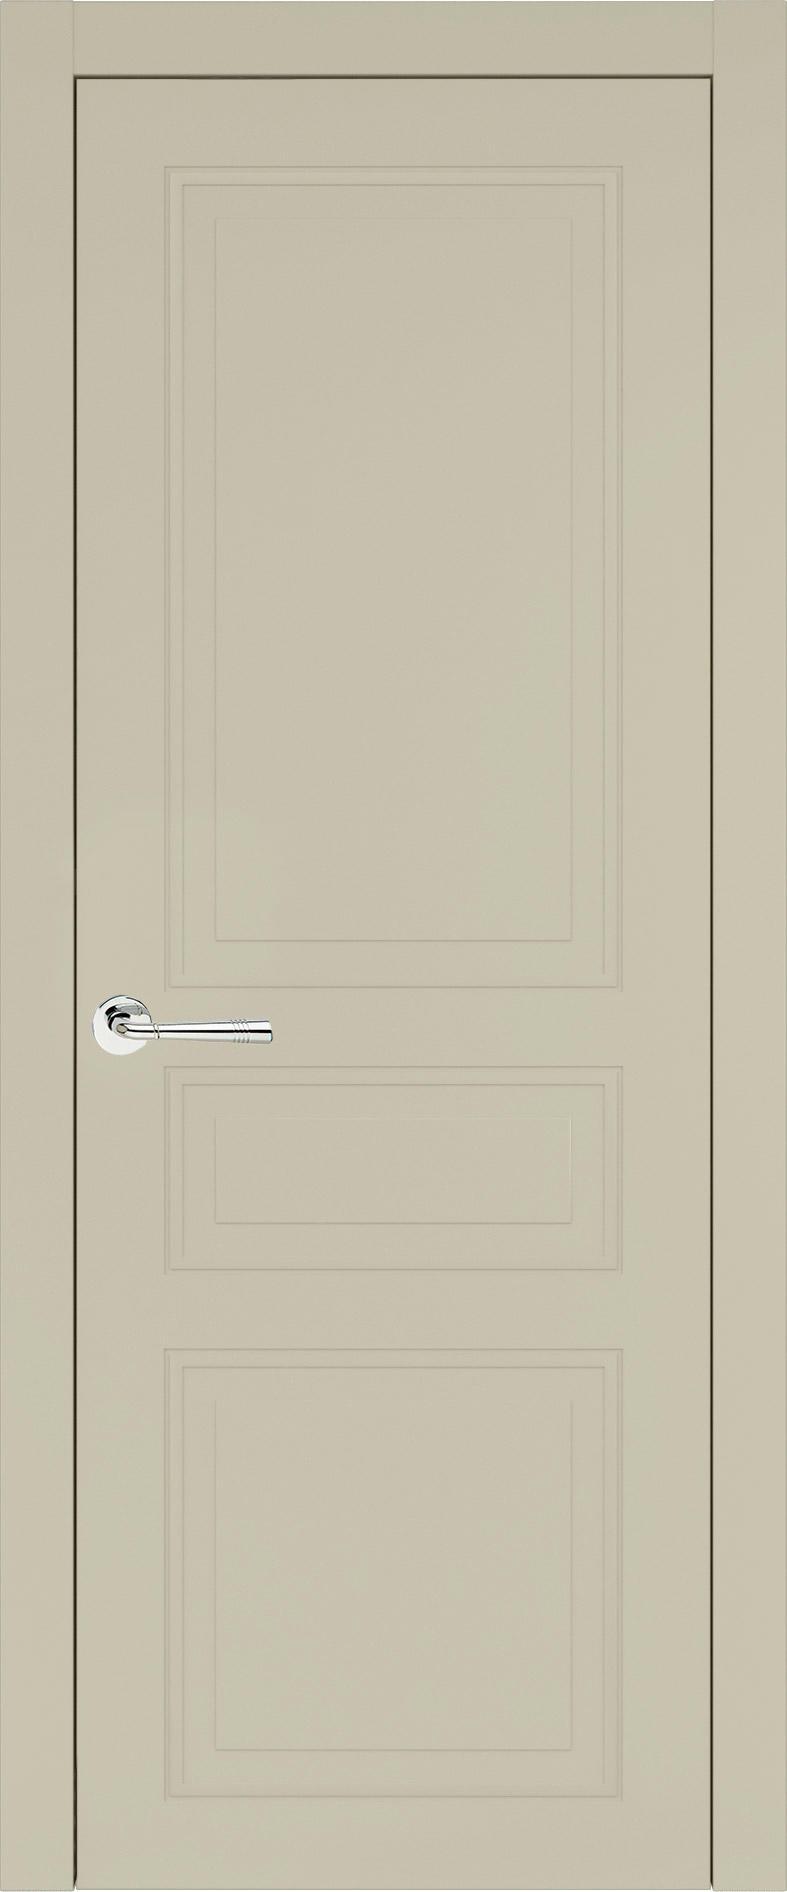 Imperia-R Neo Classic цвет - Серо-оливковая эмаль (RAL 7032) Без стекла (ДГ)